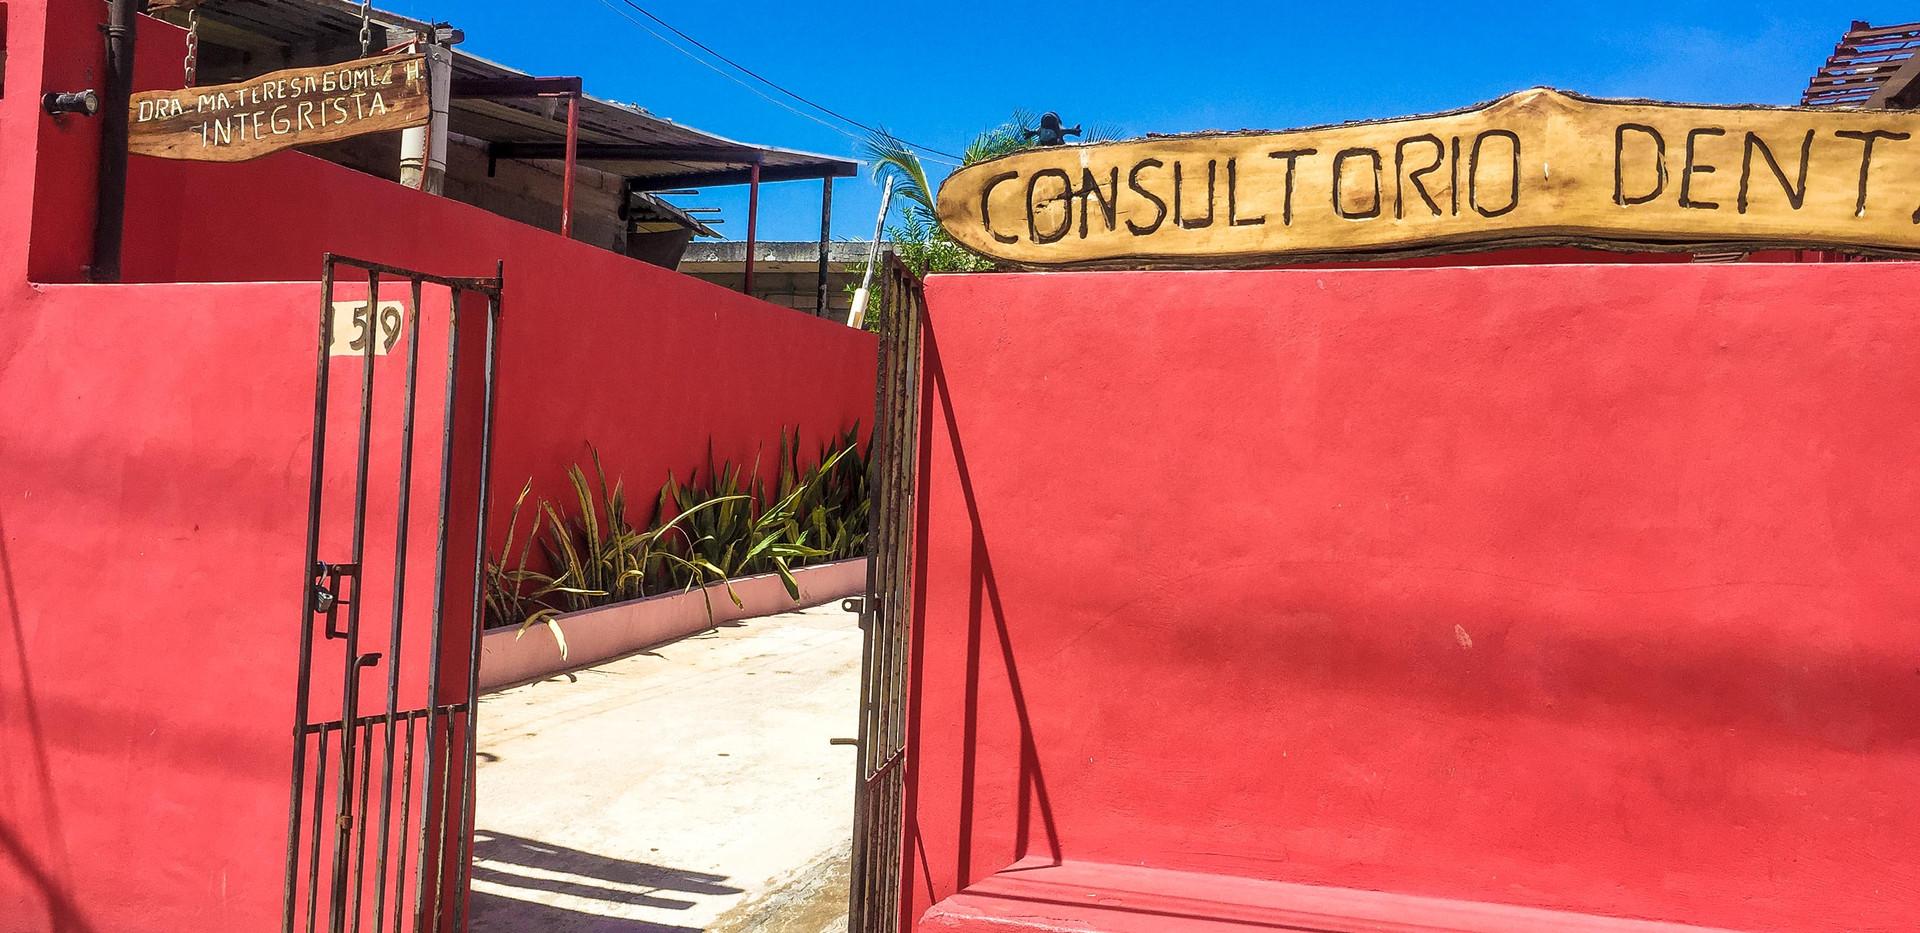 ConsultorioDental1-tasteofisla-islamujer